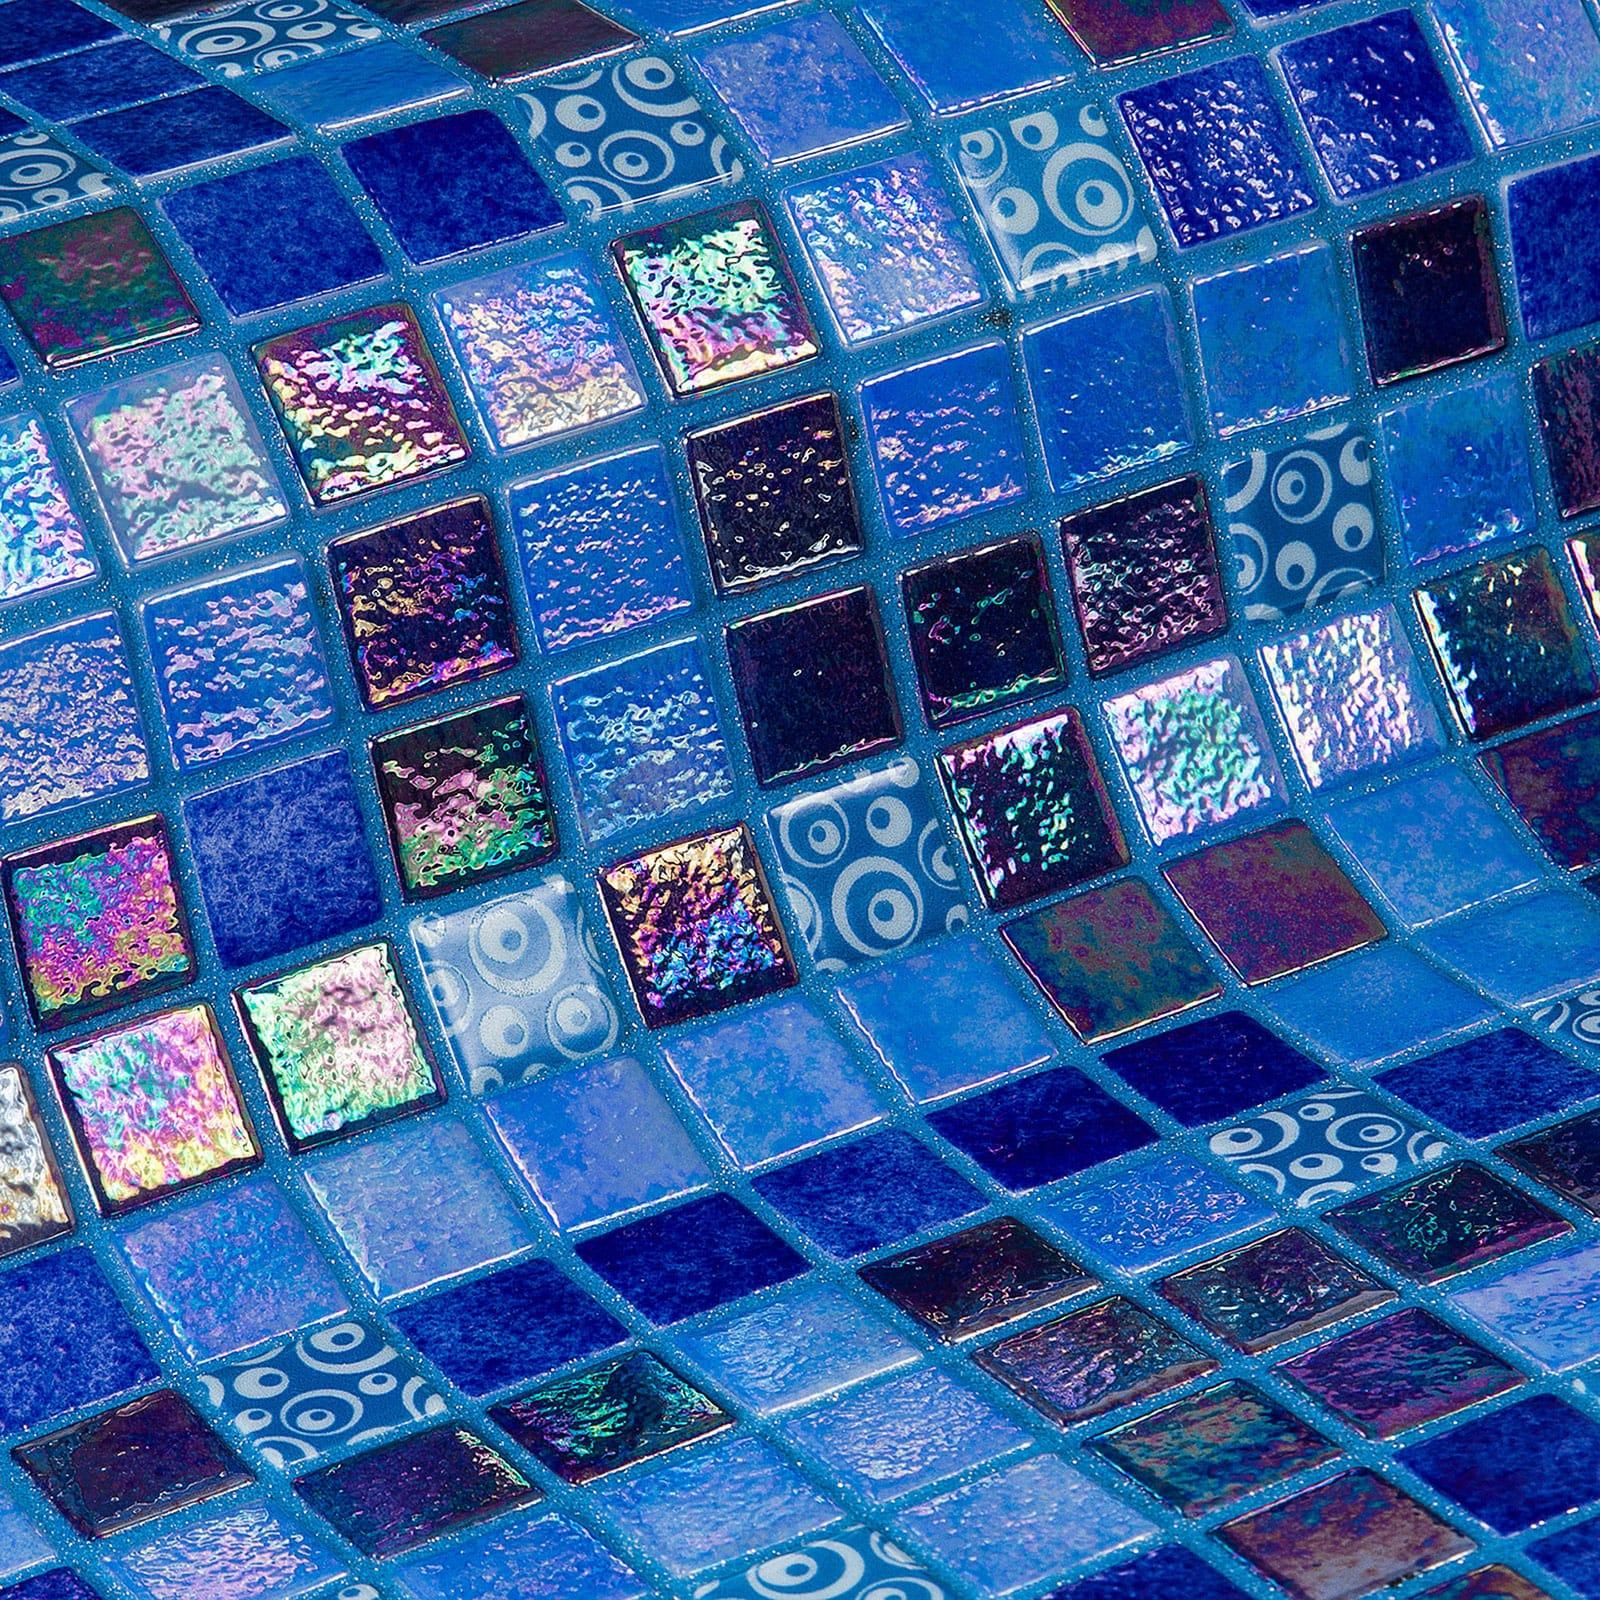 15-Blueberries-Topping-Mosaic-Ezarri.jpg